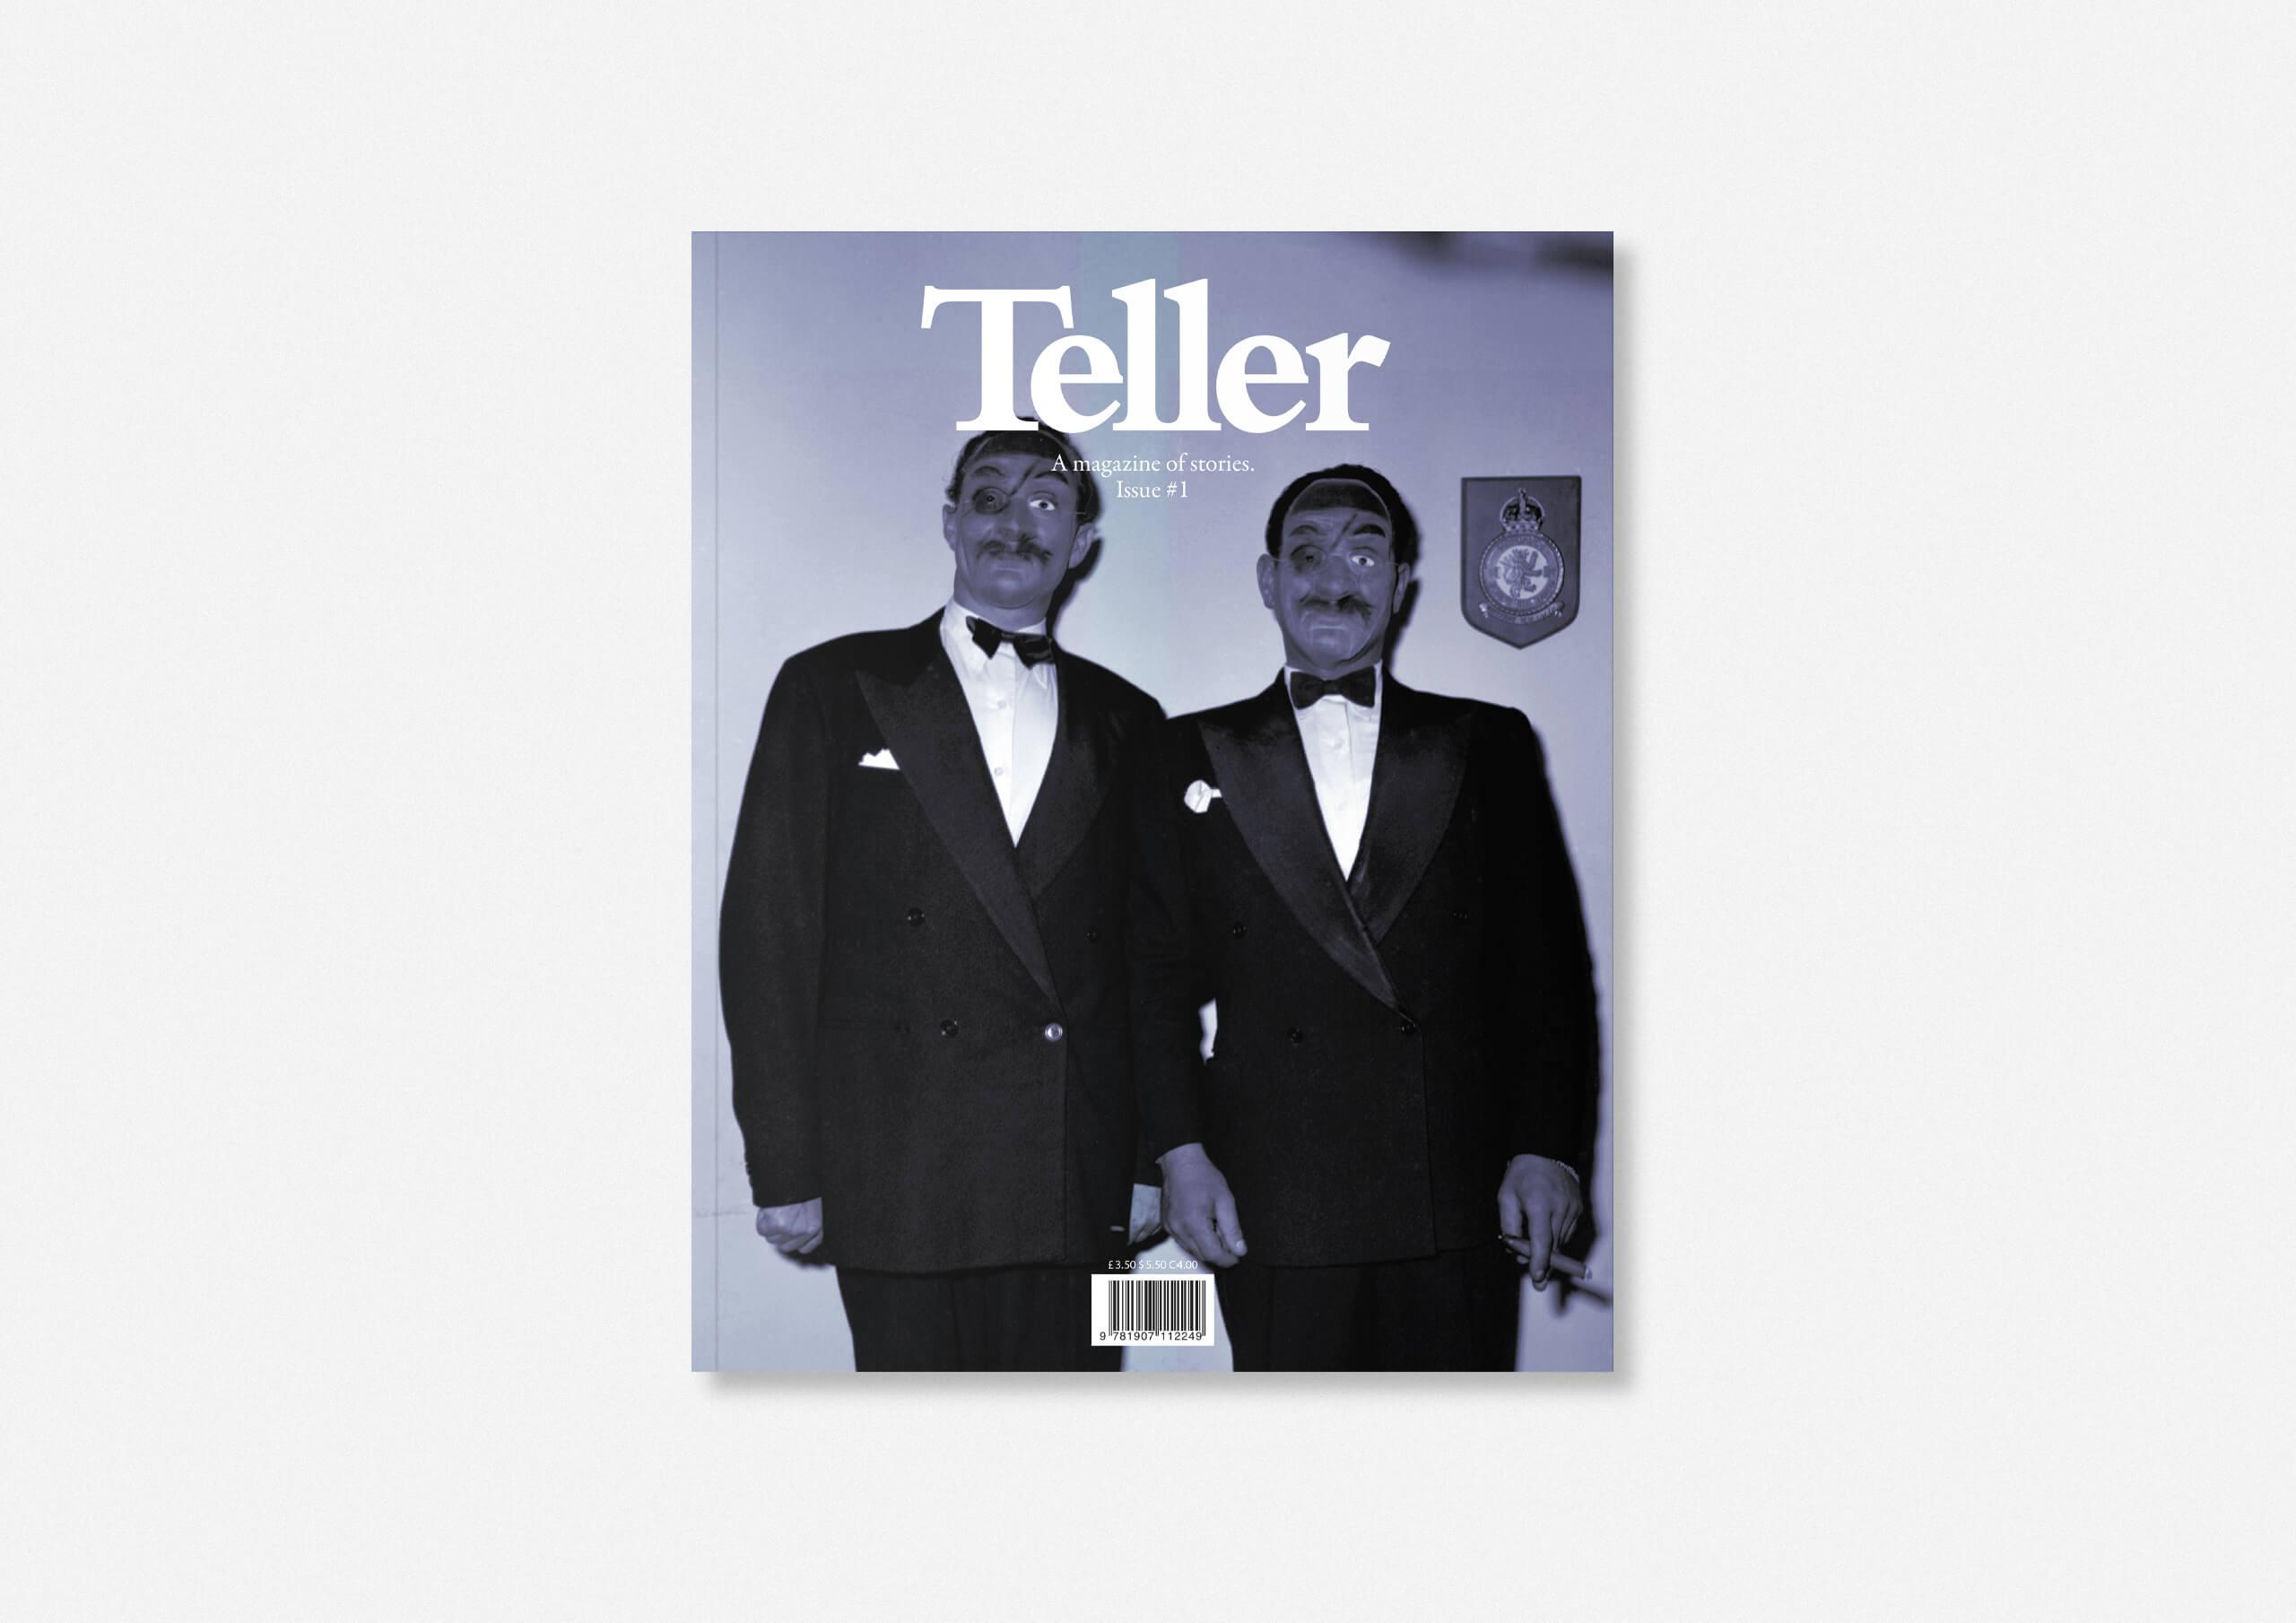 https://neuegestaltung.de/media/pages/clients/teller-magazine-issue-1/fed97293a4-1597415428/teller_issue_01_vorderseite_ng.jpg